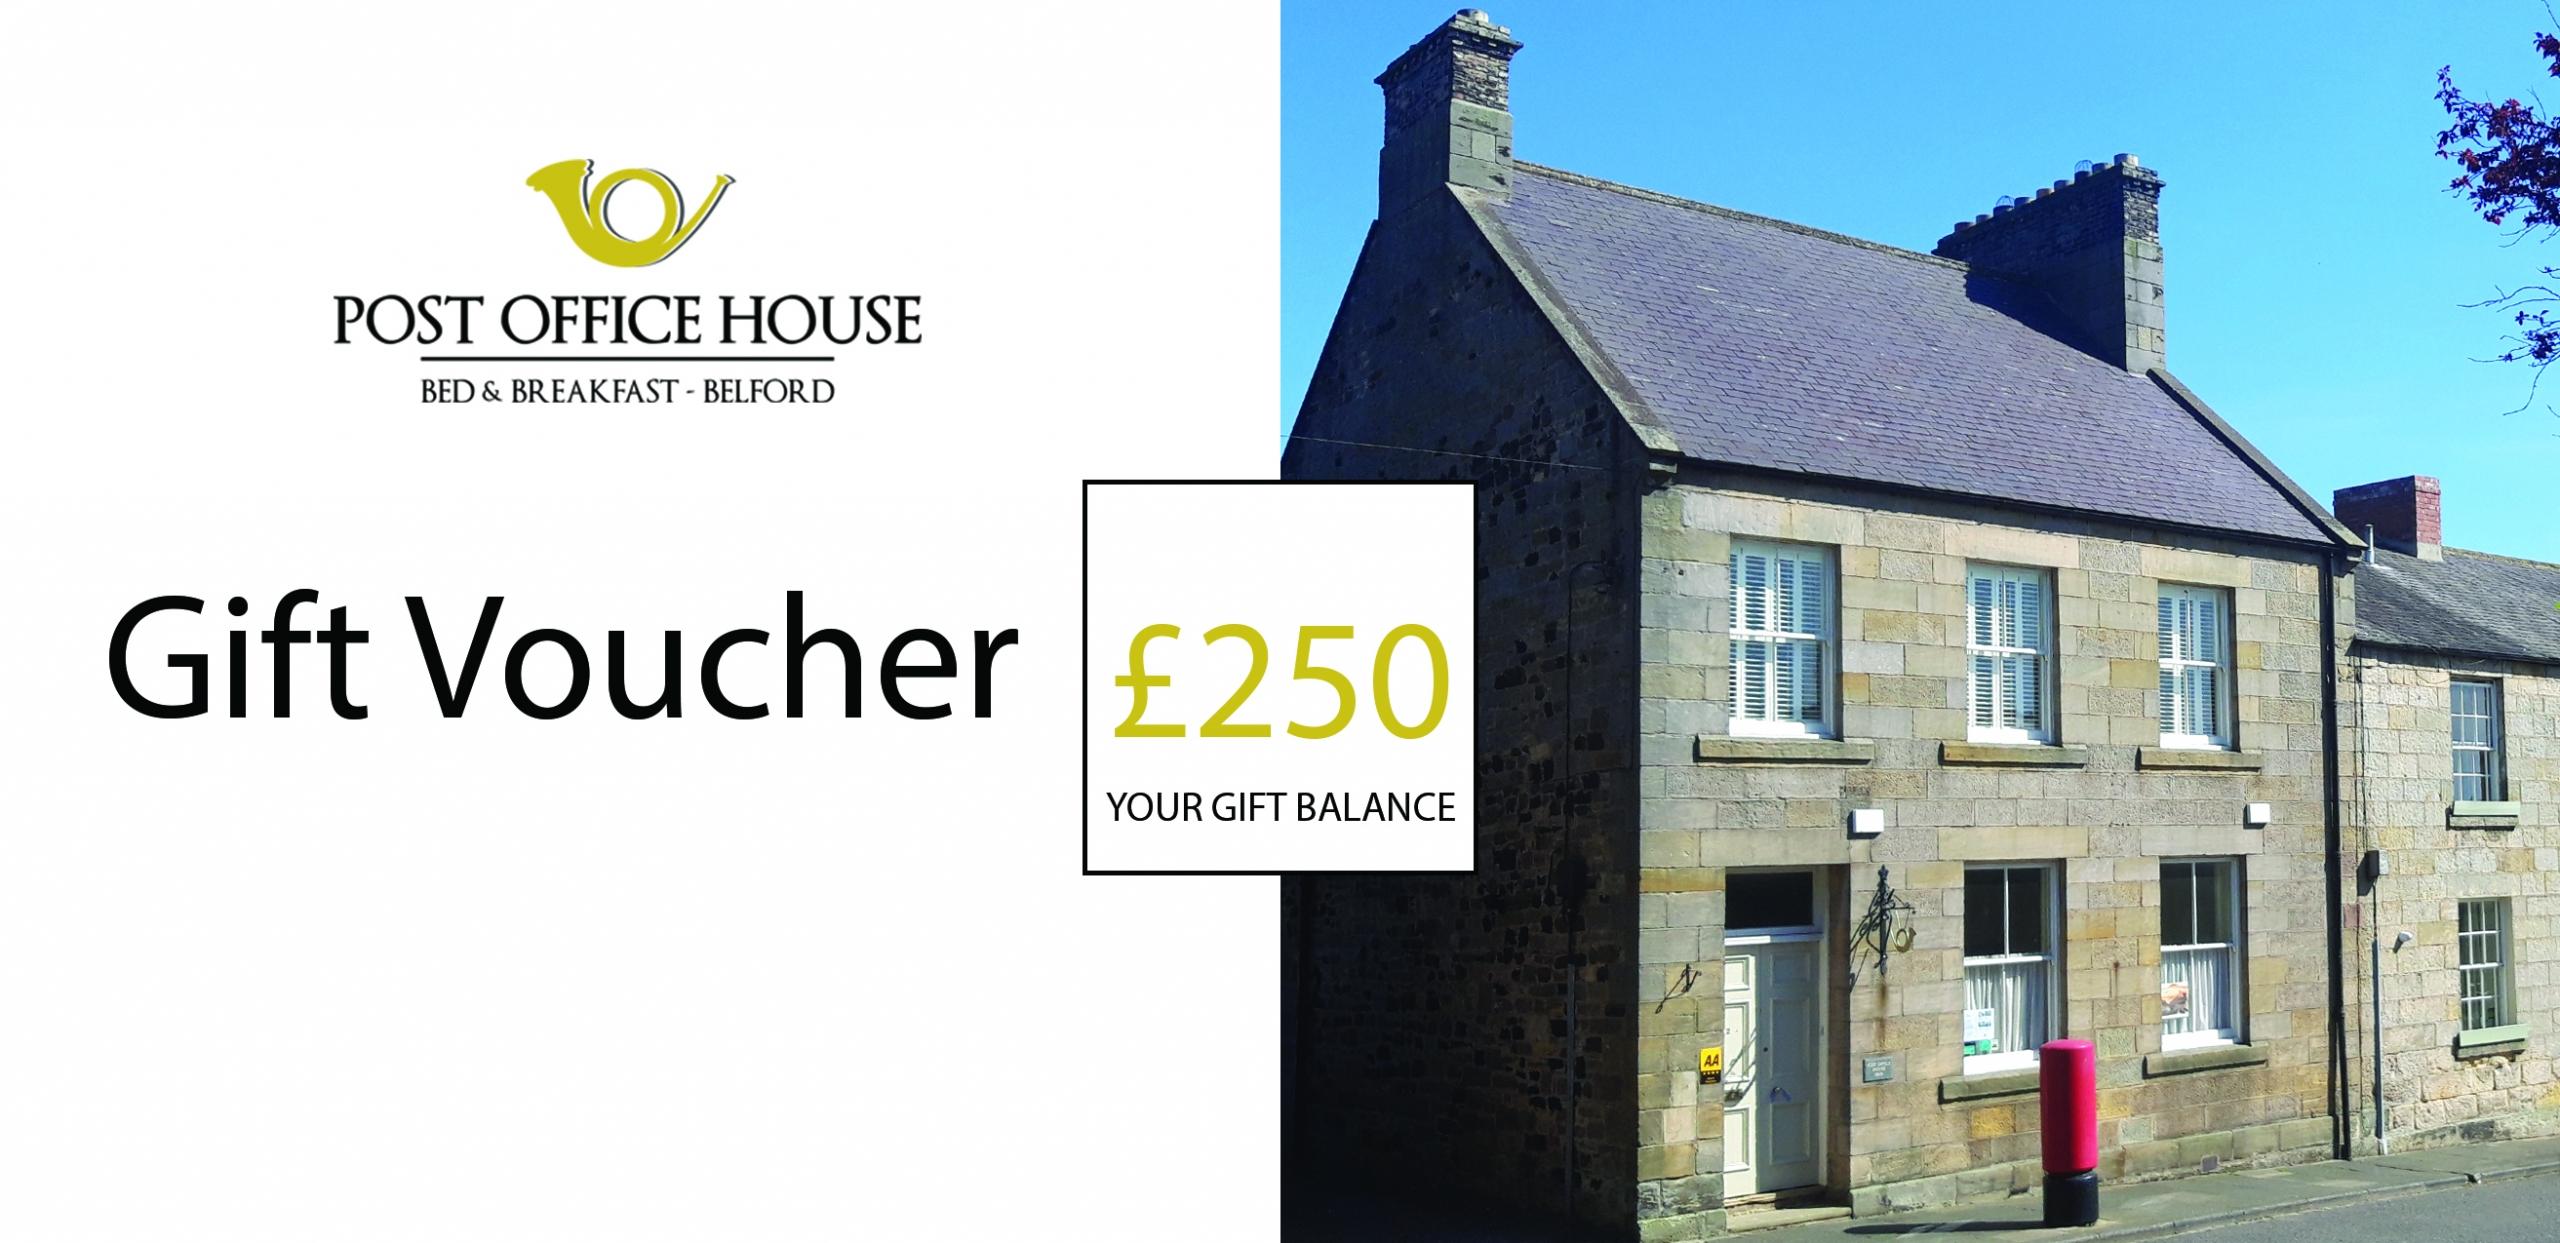 Post Office House £250 Voucher